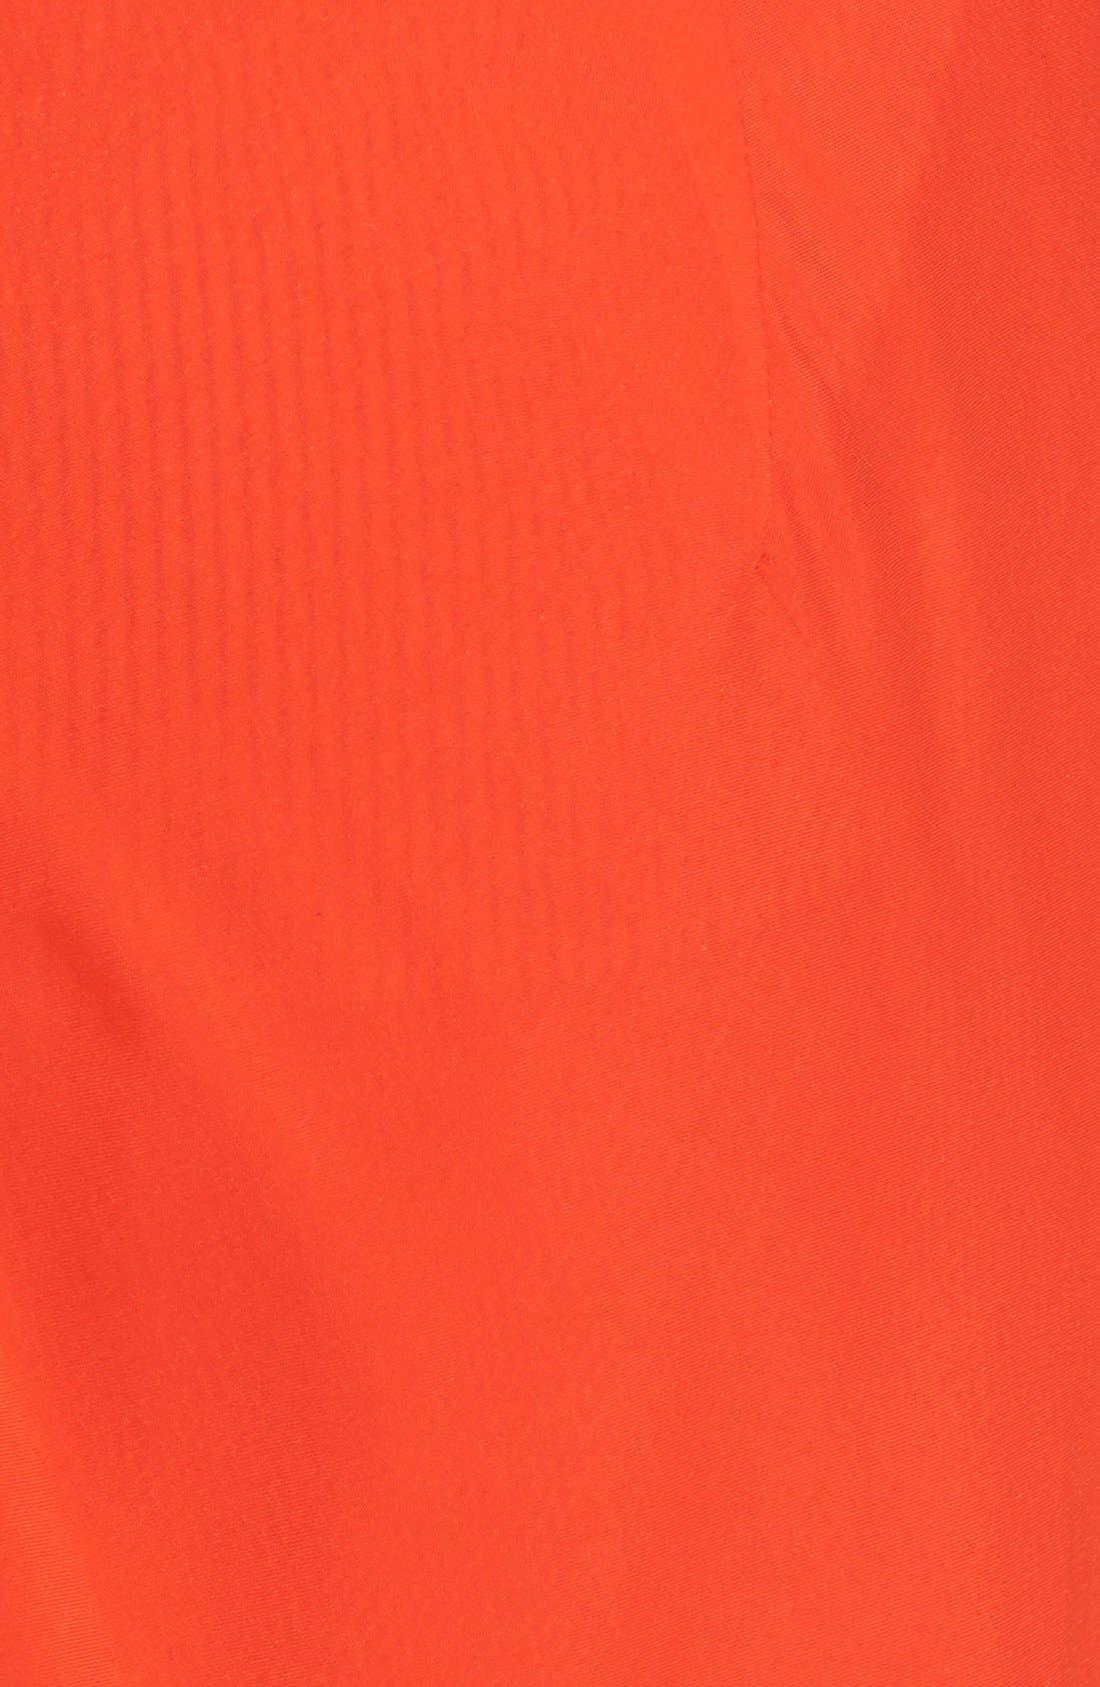 Alternate Image 3  - TOGA Asymmetrical Illusion Hem Skirt